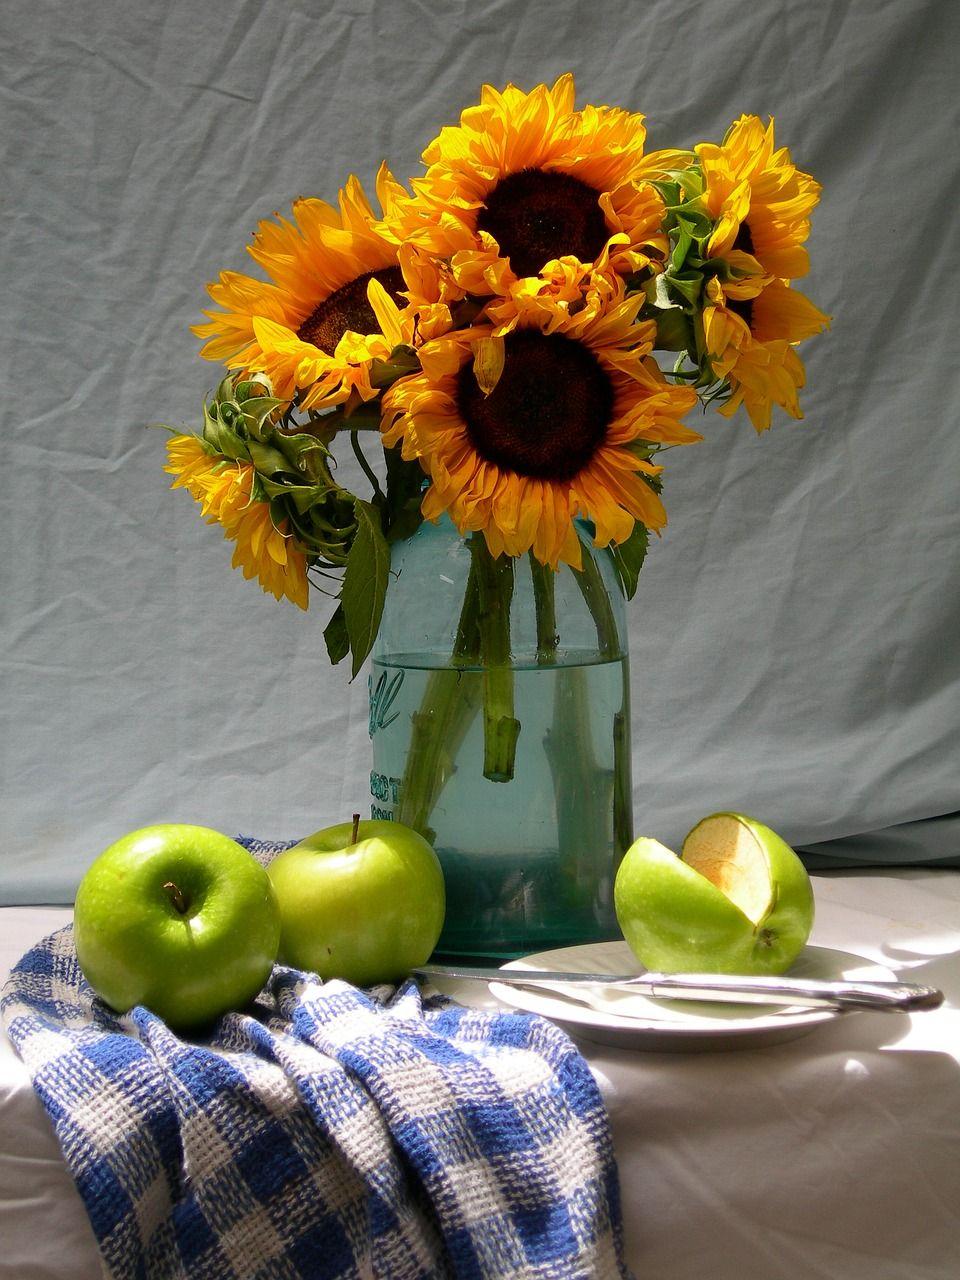 Free Image on Pixabay Sunflowers, Apples, Life, Still